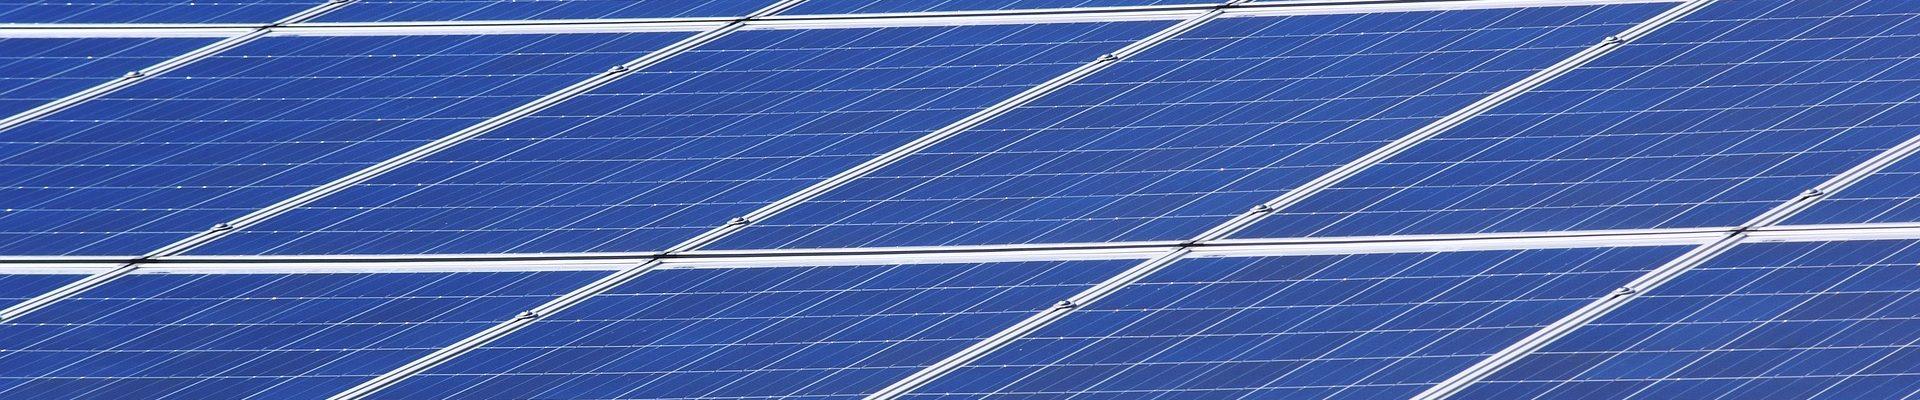 photovoltaic-2138994_1920